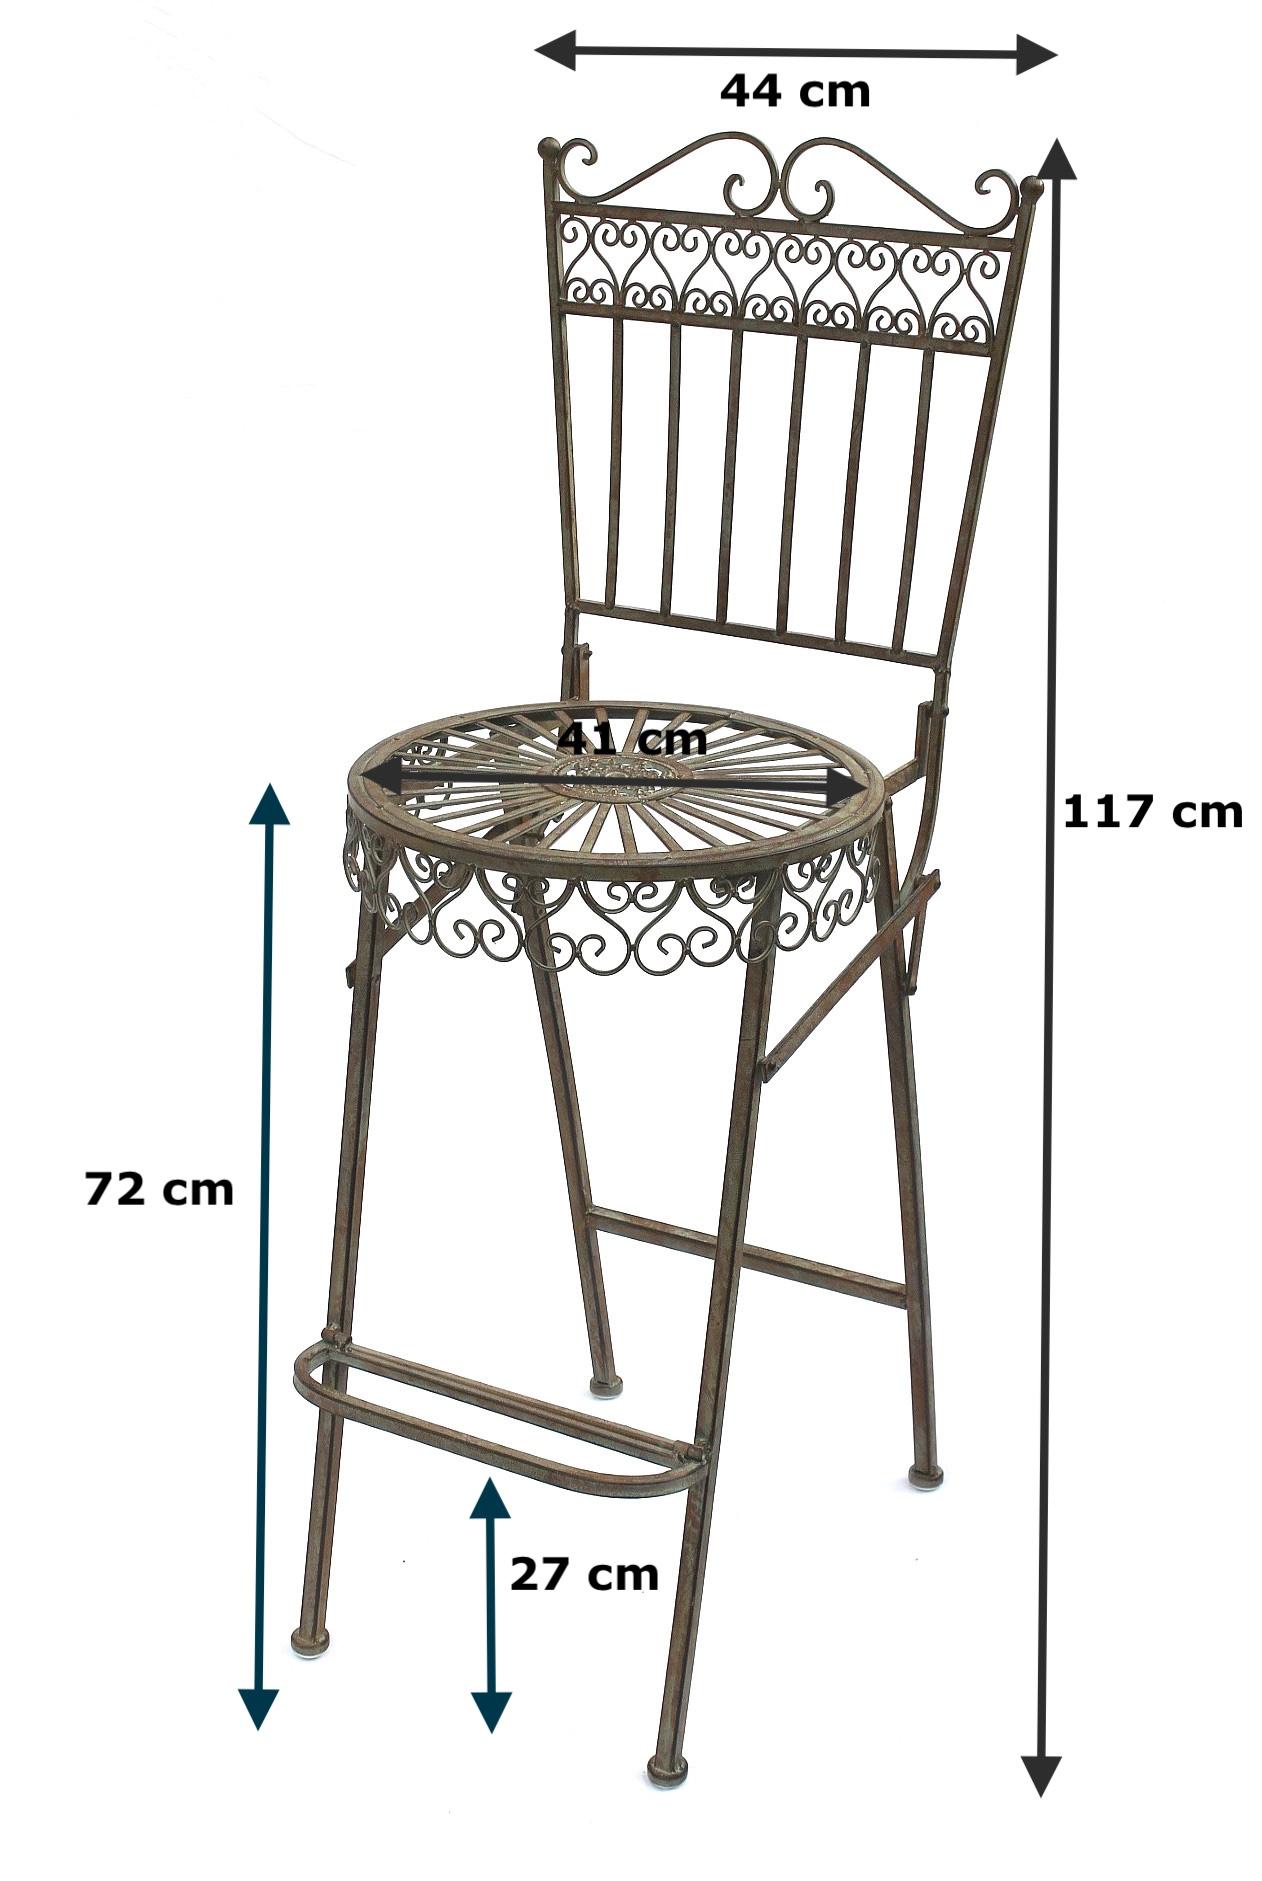 DanDiBo Stehtisch + 2 Barhocker Set Metall 130414-15